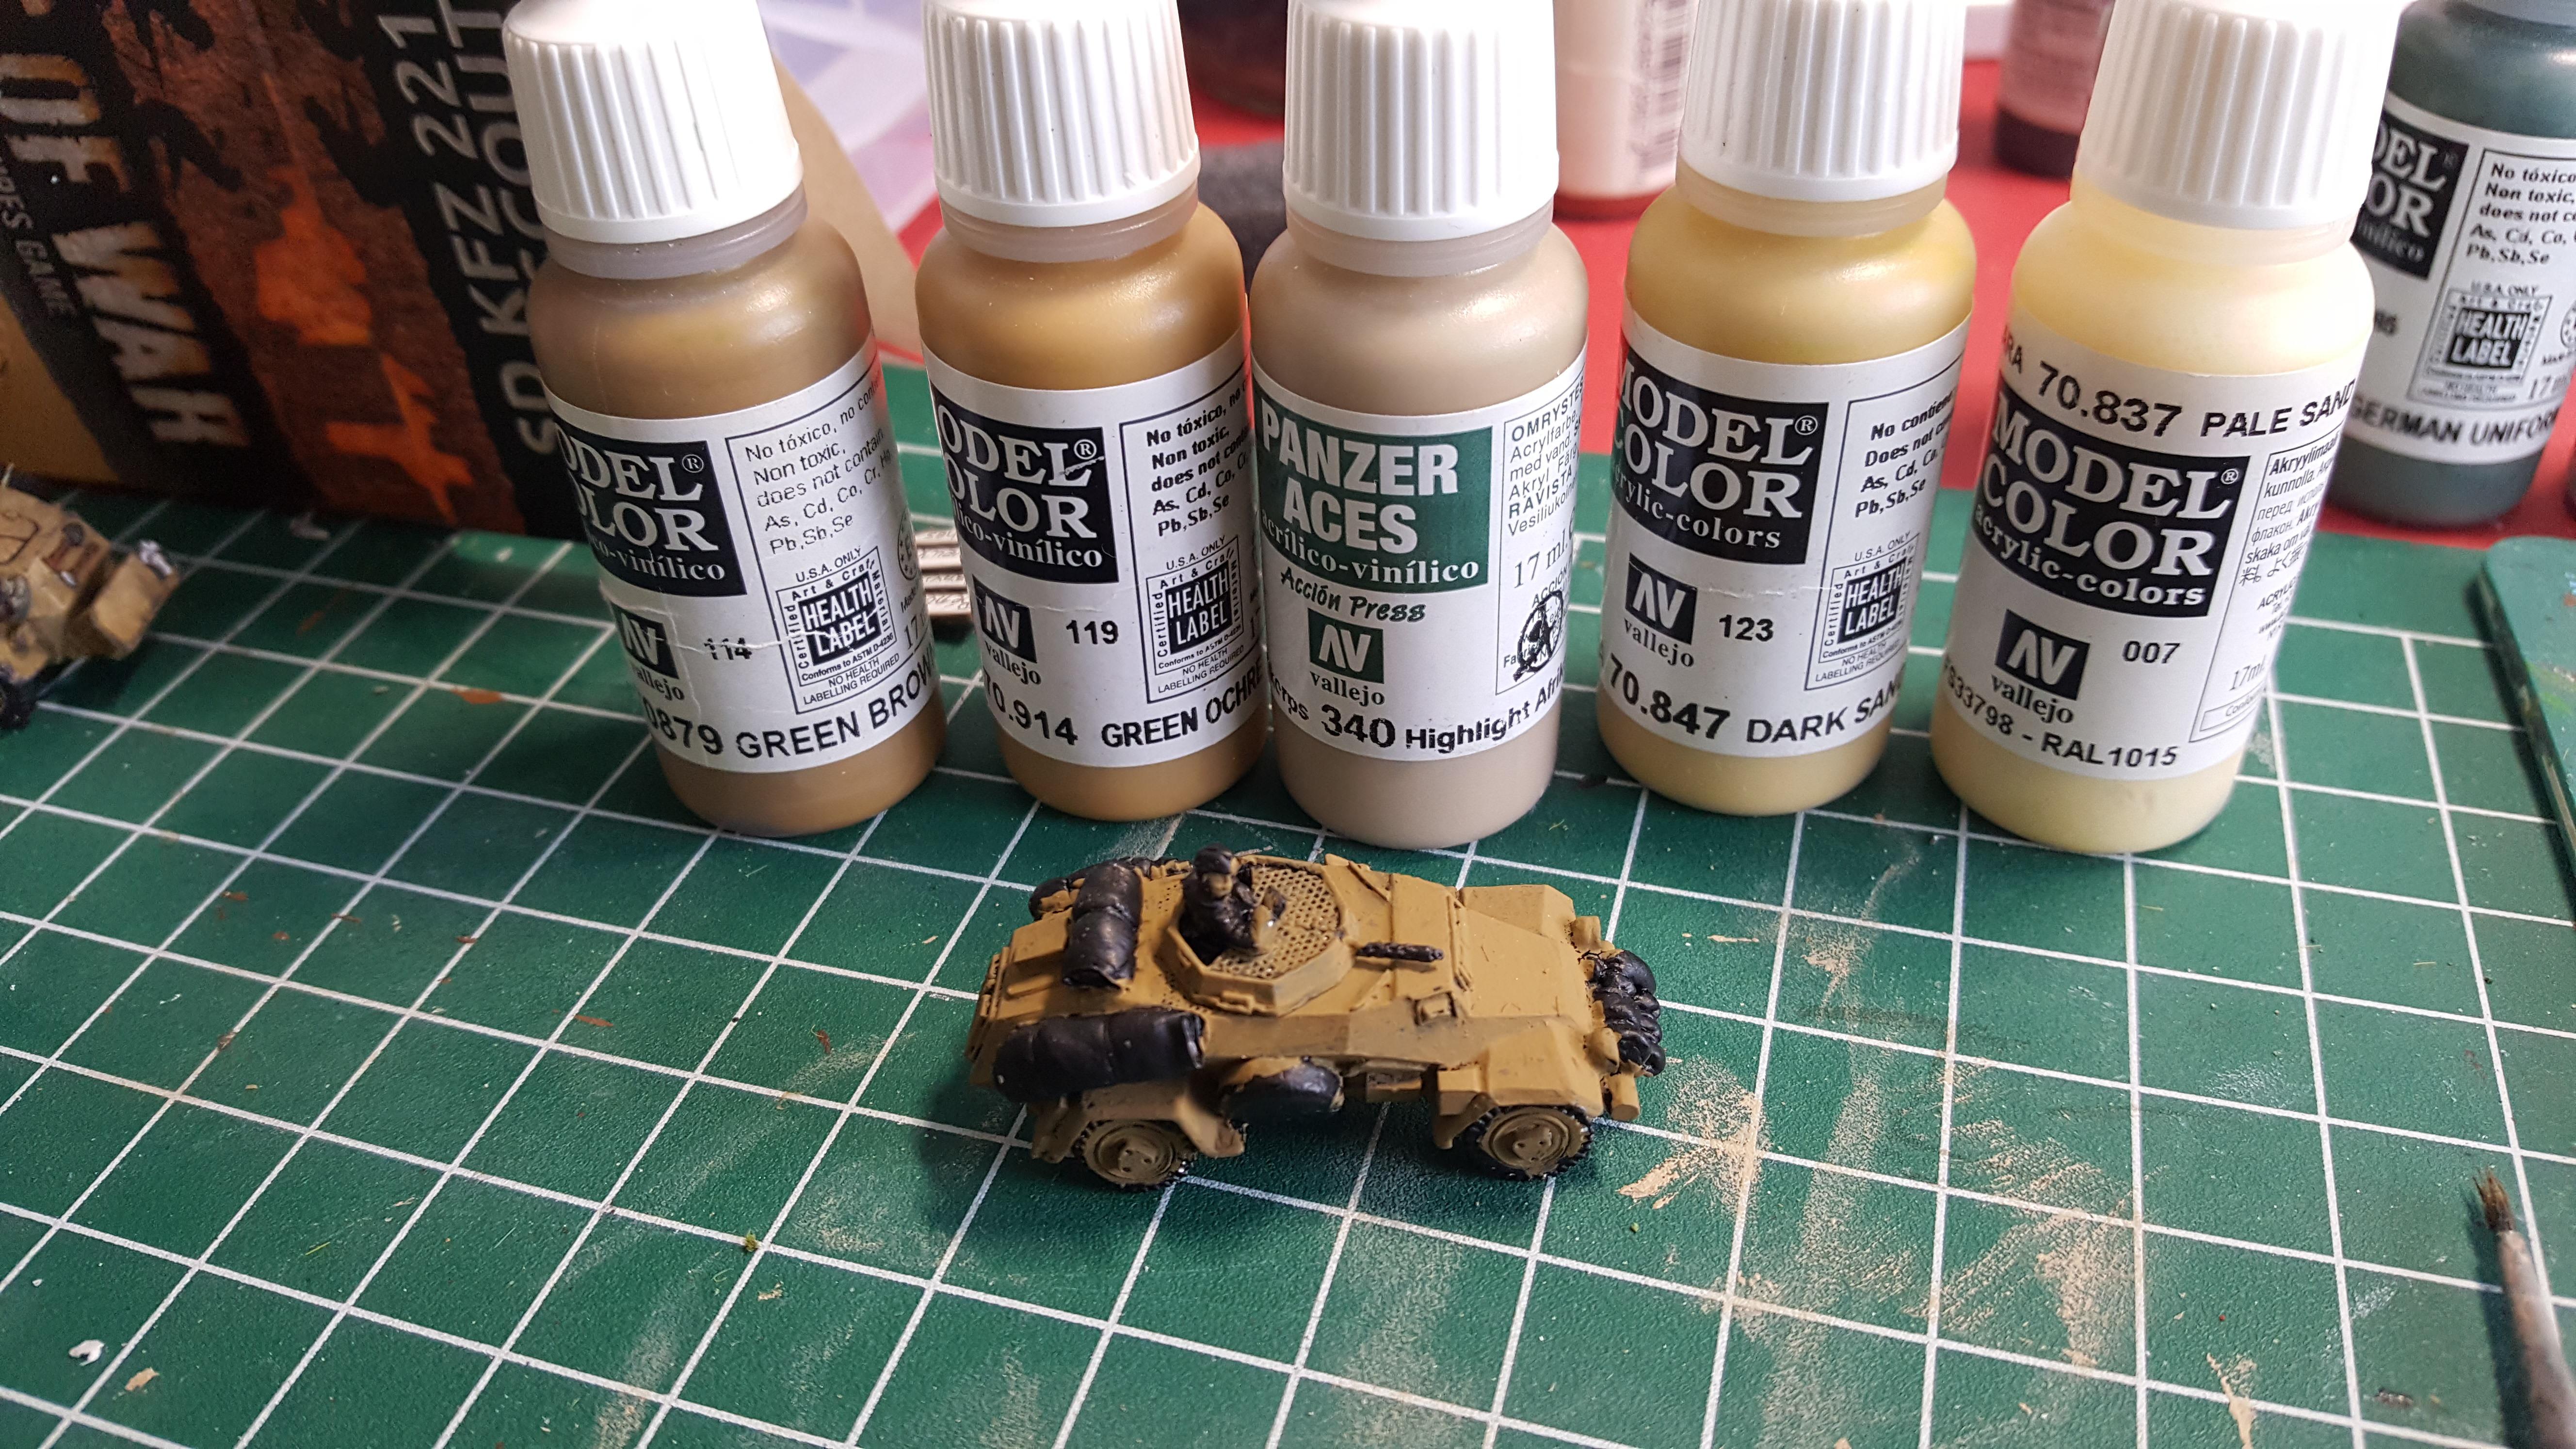 Afrika Korps Army Paint, Part II Vehicles – No Dice No Glory